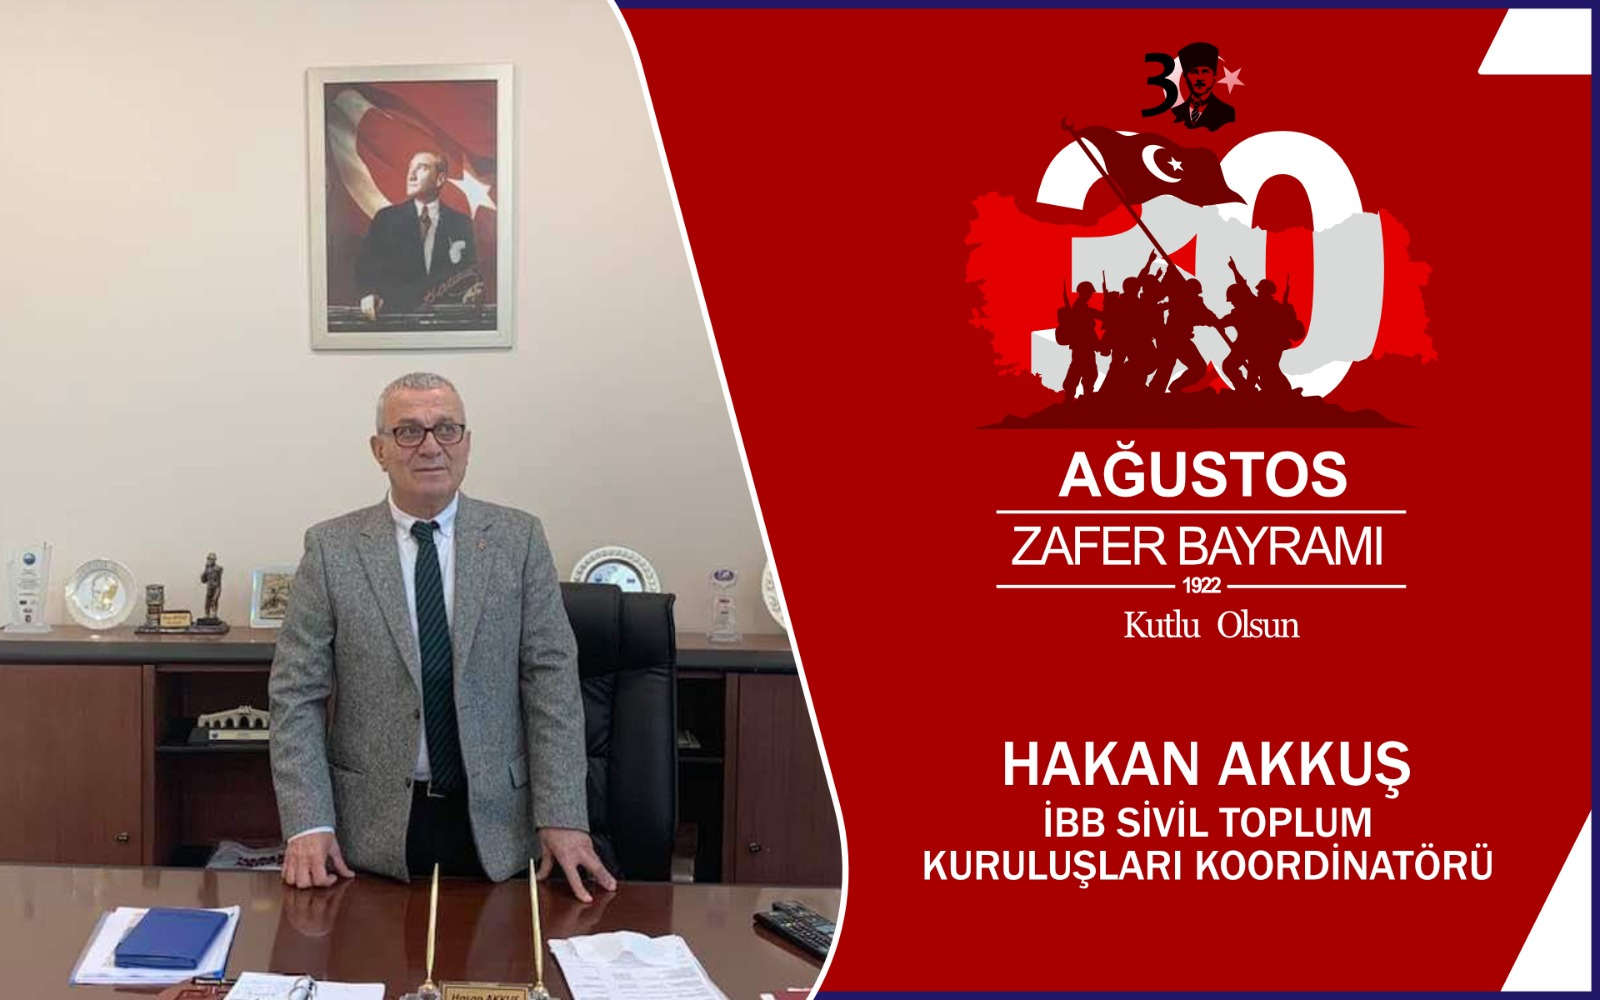 Hasan Akkuş'tan Kutlama Mesajı